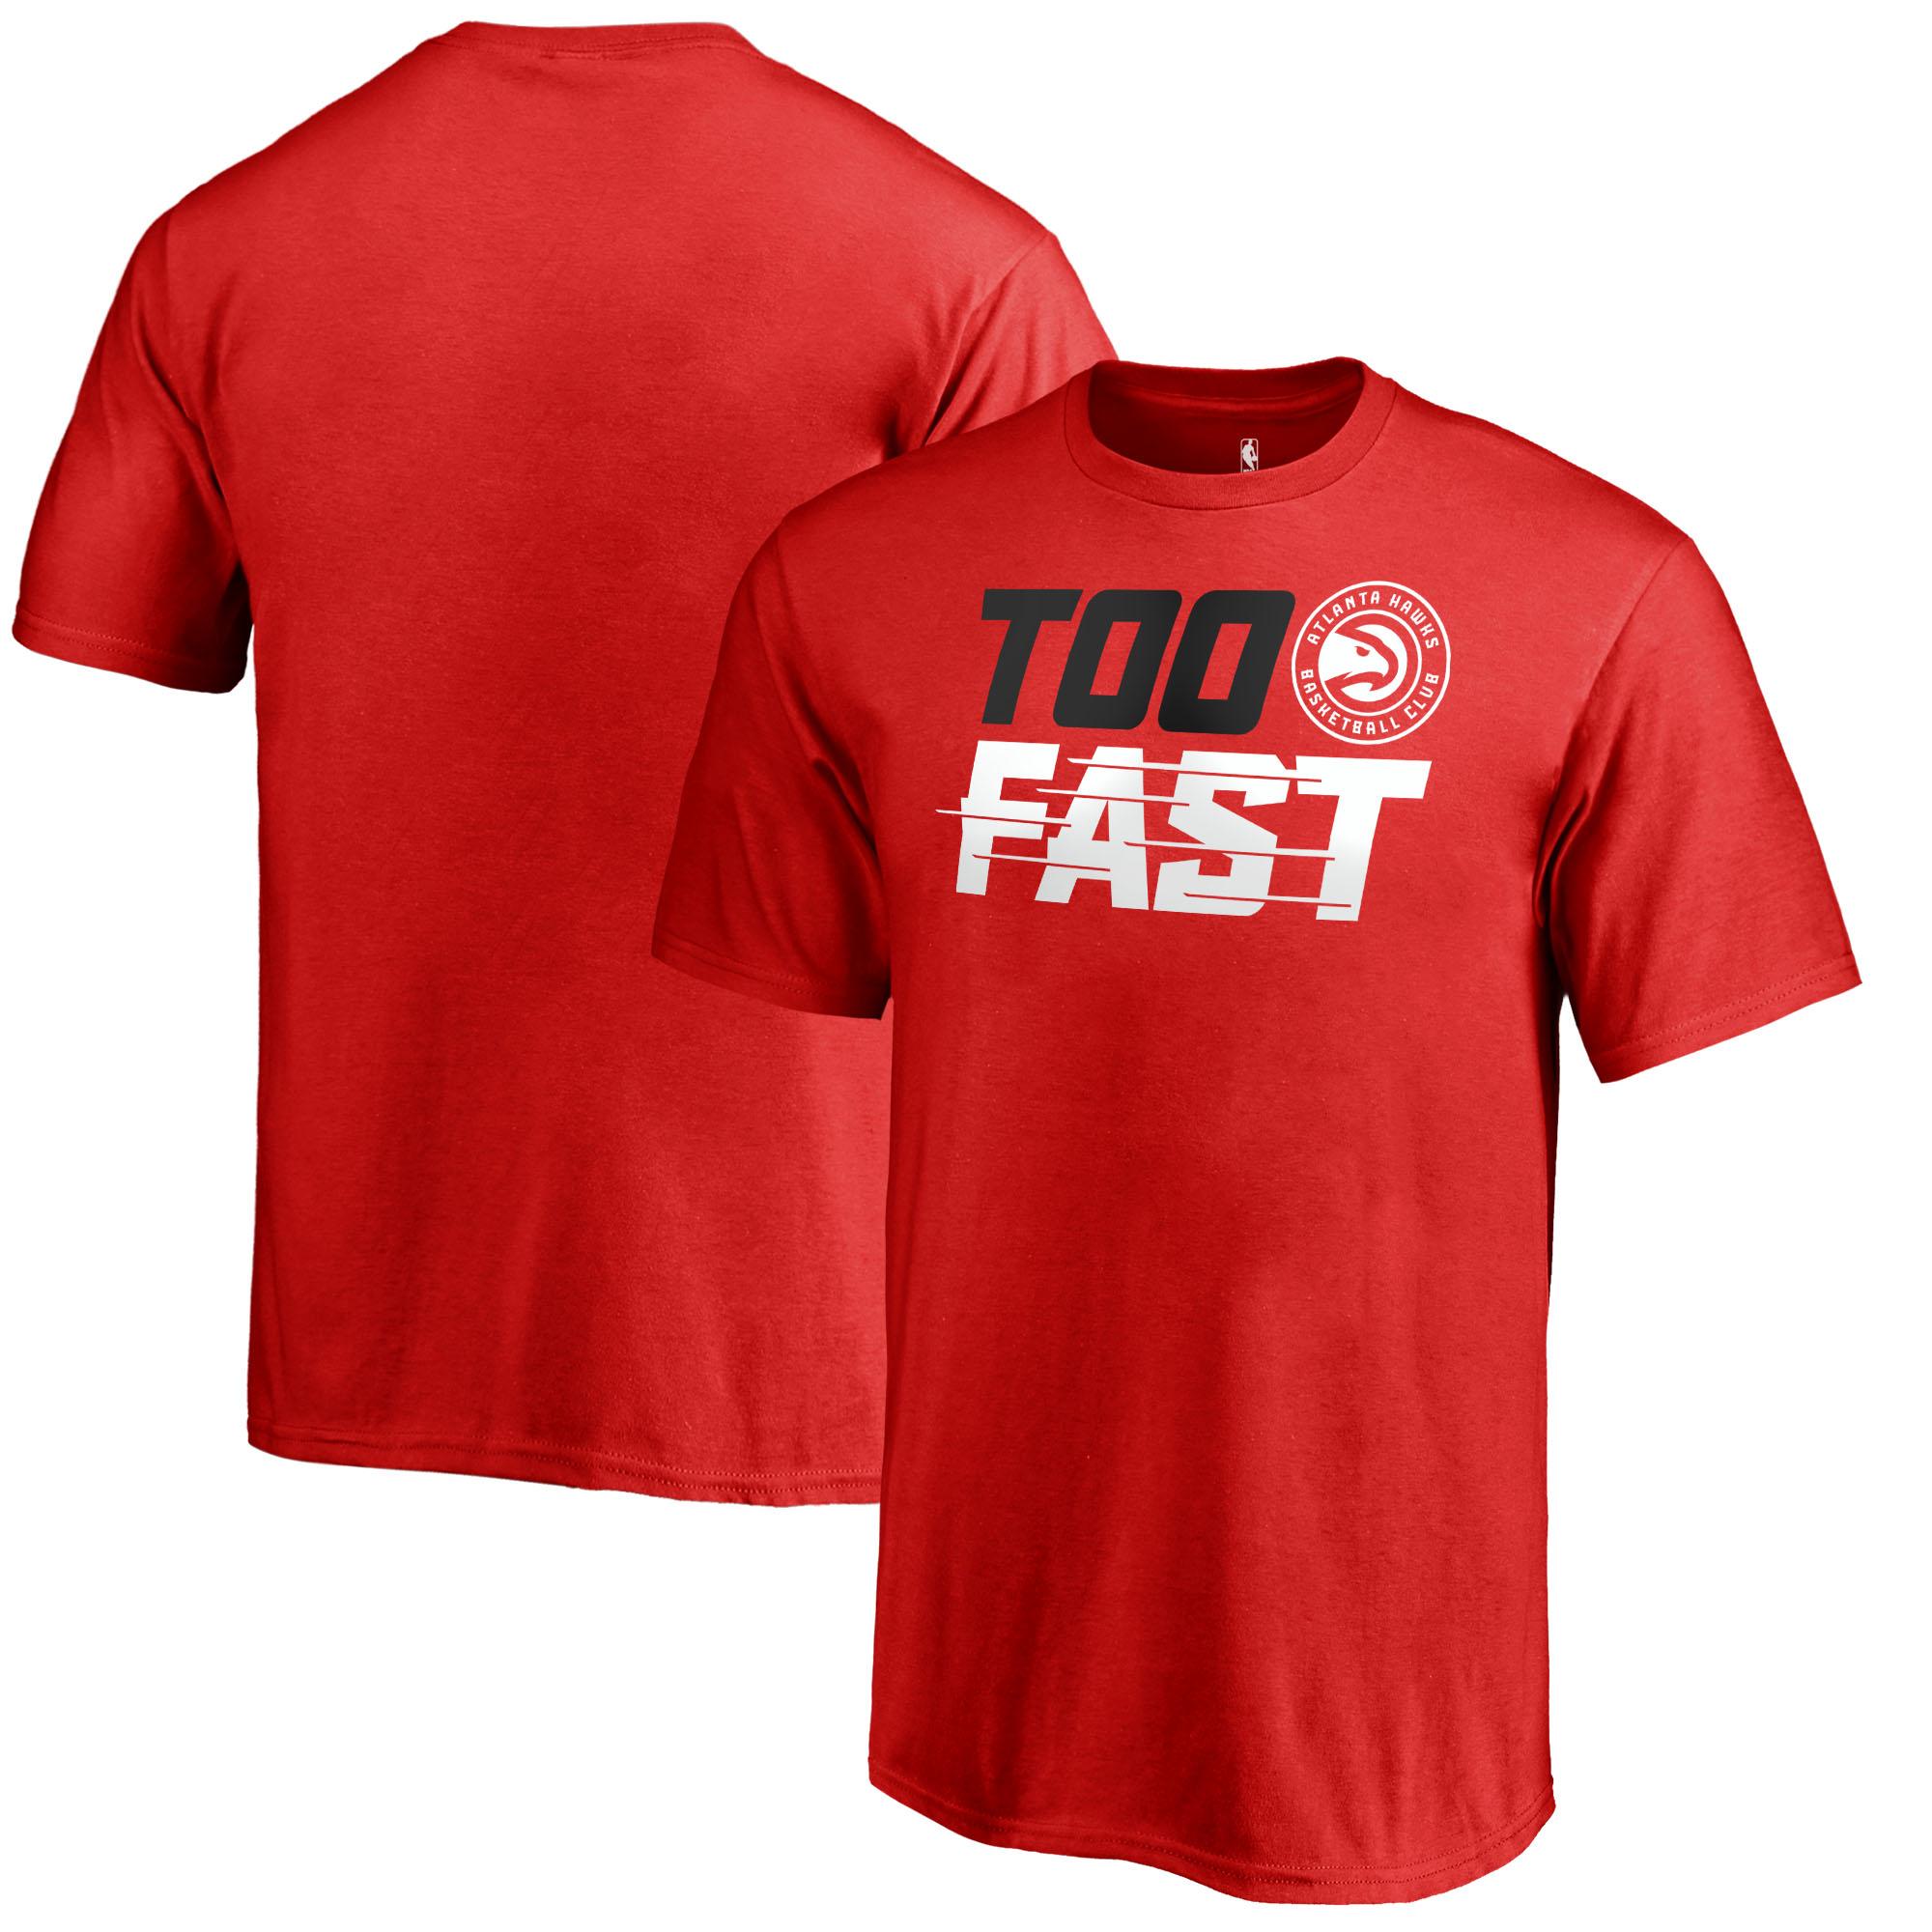 Atlanta Hawks Fanatics Branded Youth Too Fast T-Shirt - Red